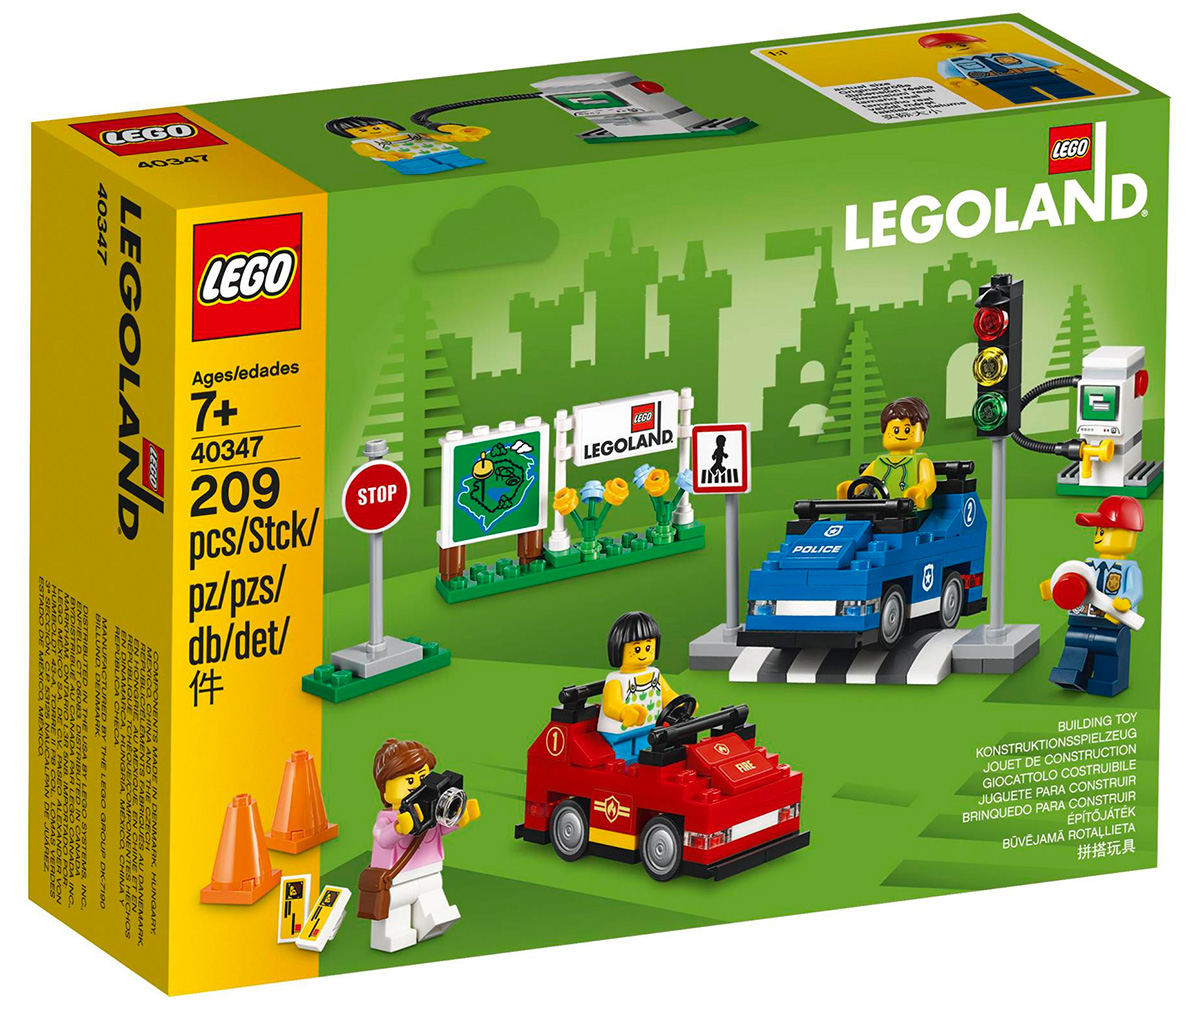 Nouveauté LEGO 40347 LEGOLAND Driving School - HelloBricks